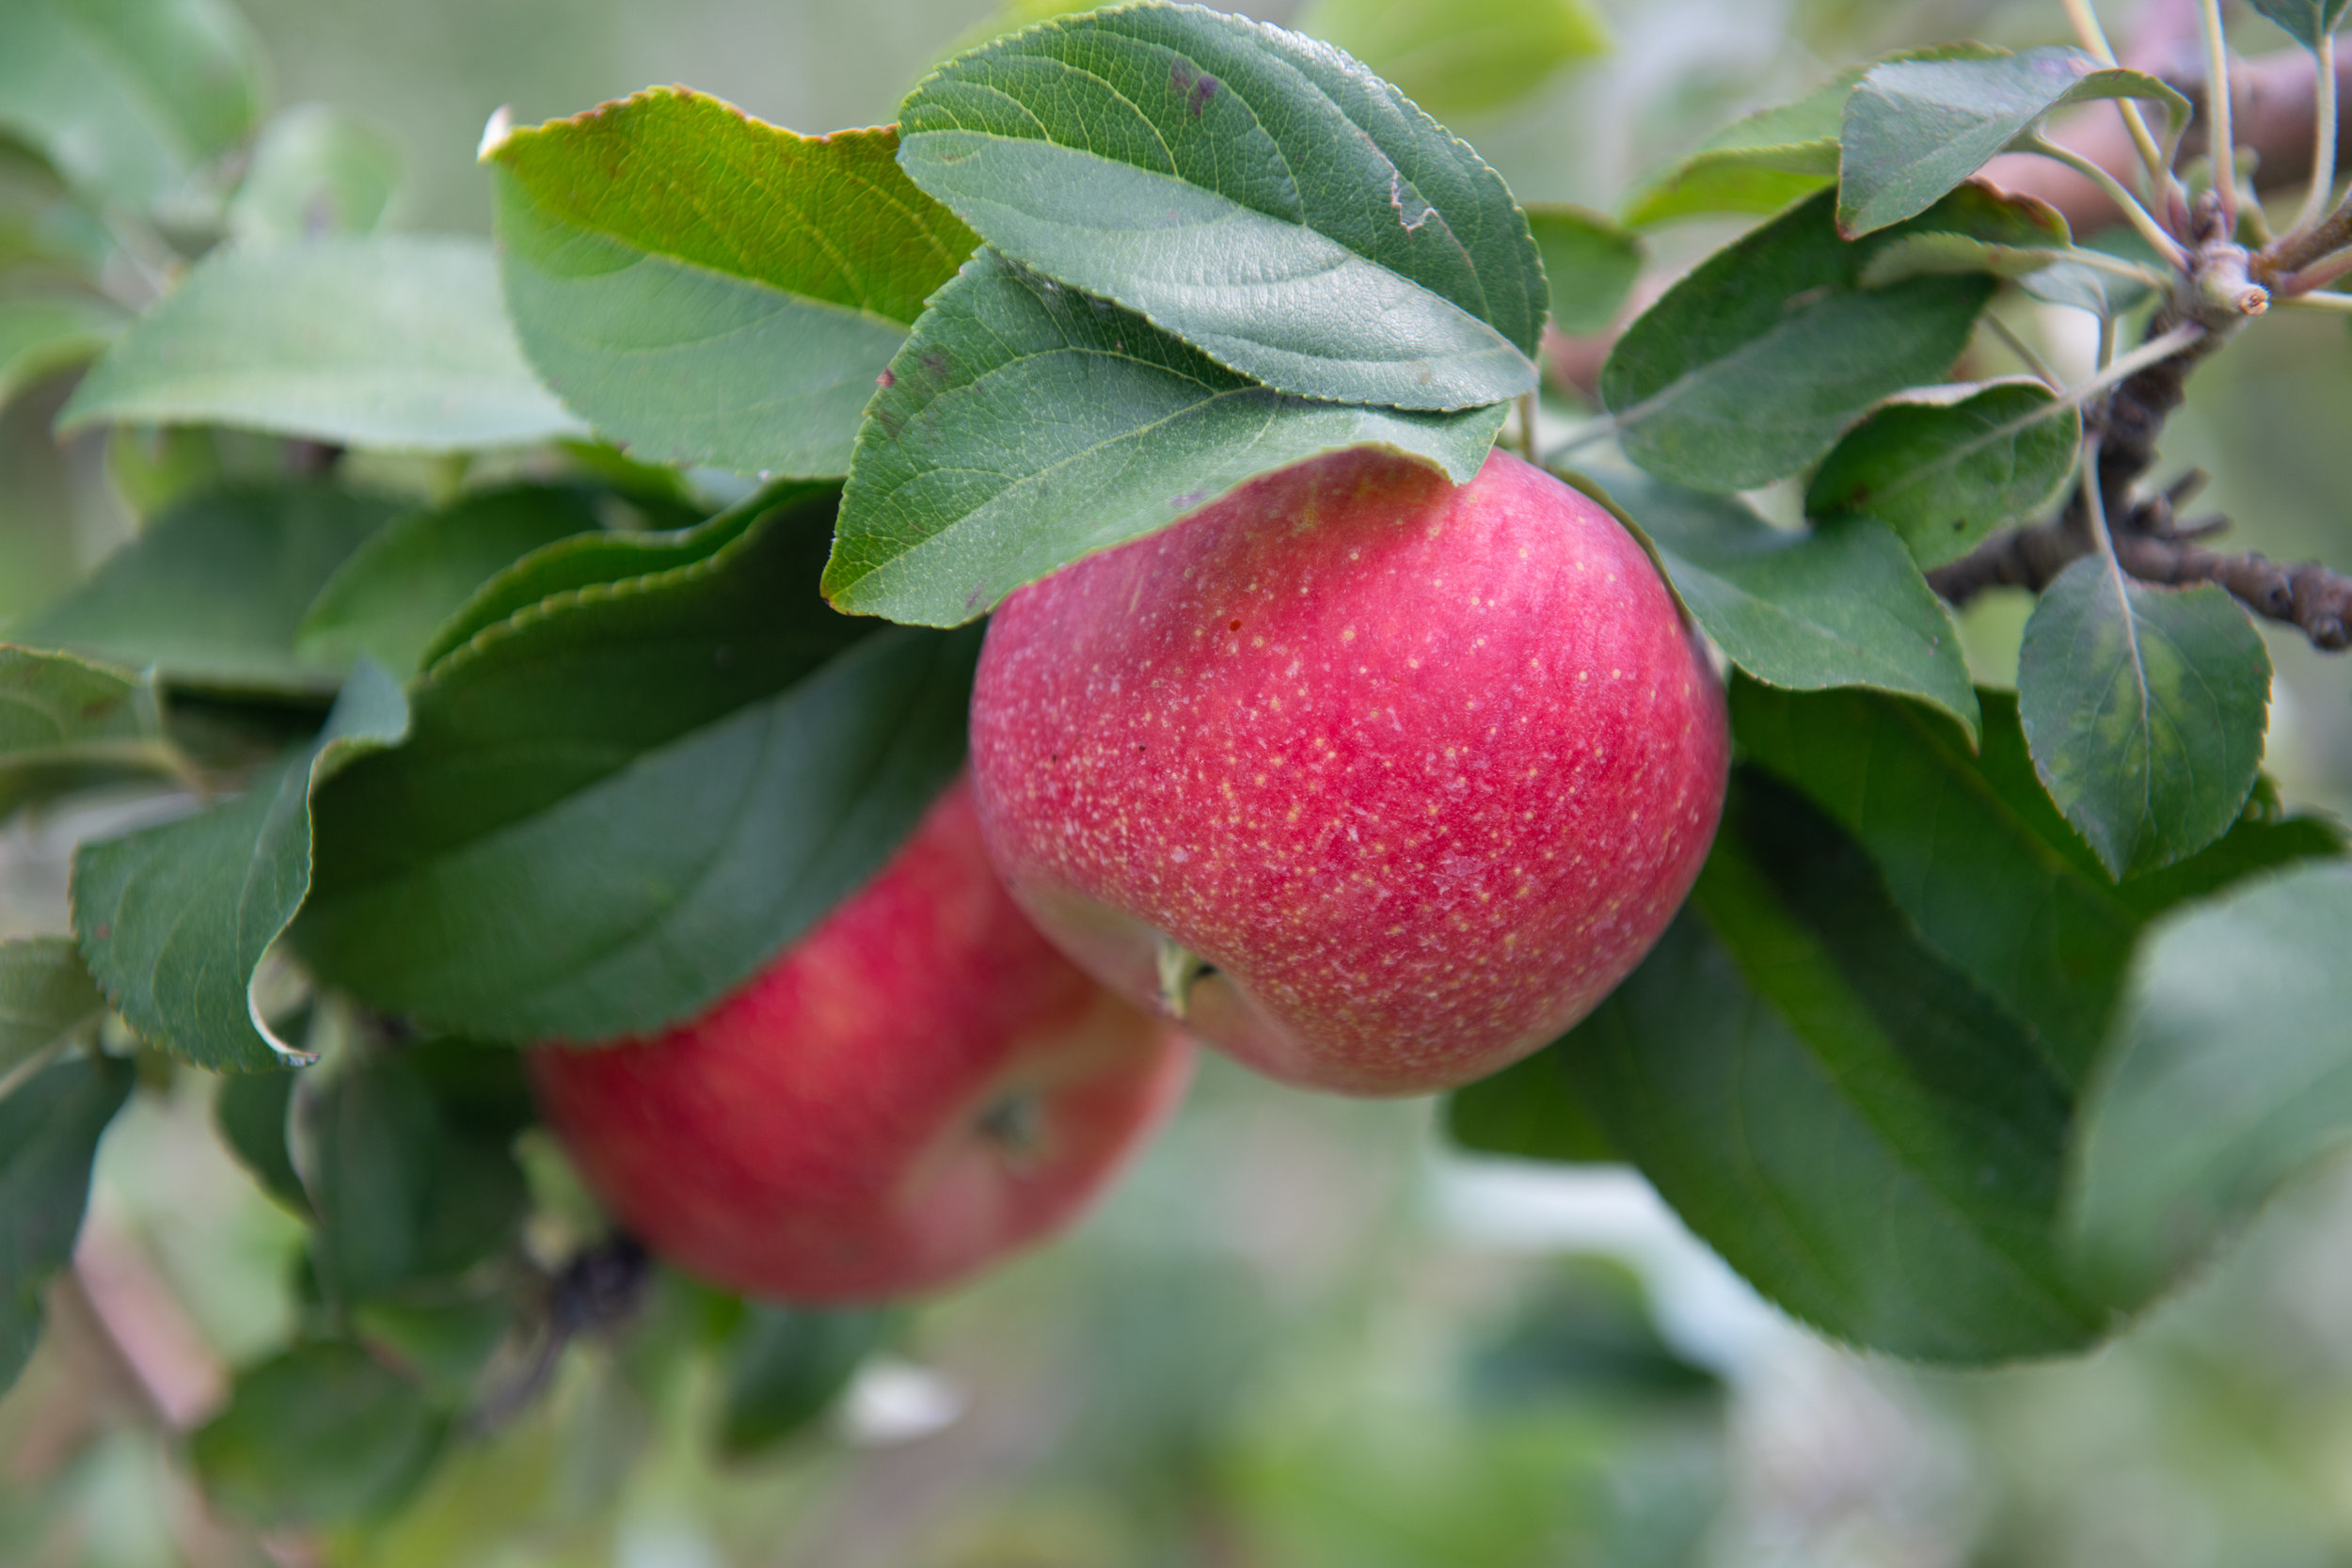 Center Grove Orchard has more than 6,000 apple trees. Photo credit: Joseph L. Murphy/Iowa Soybean Association